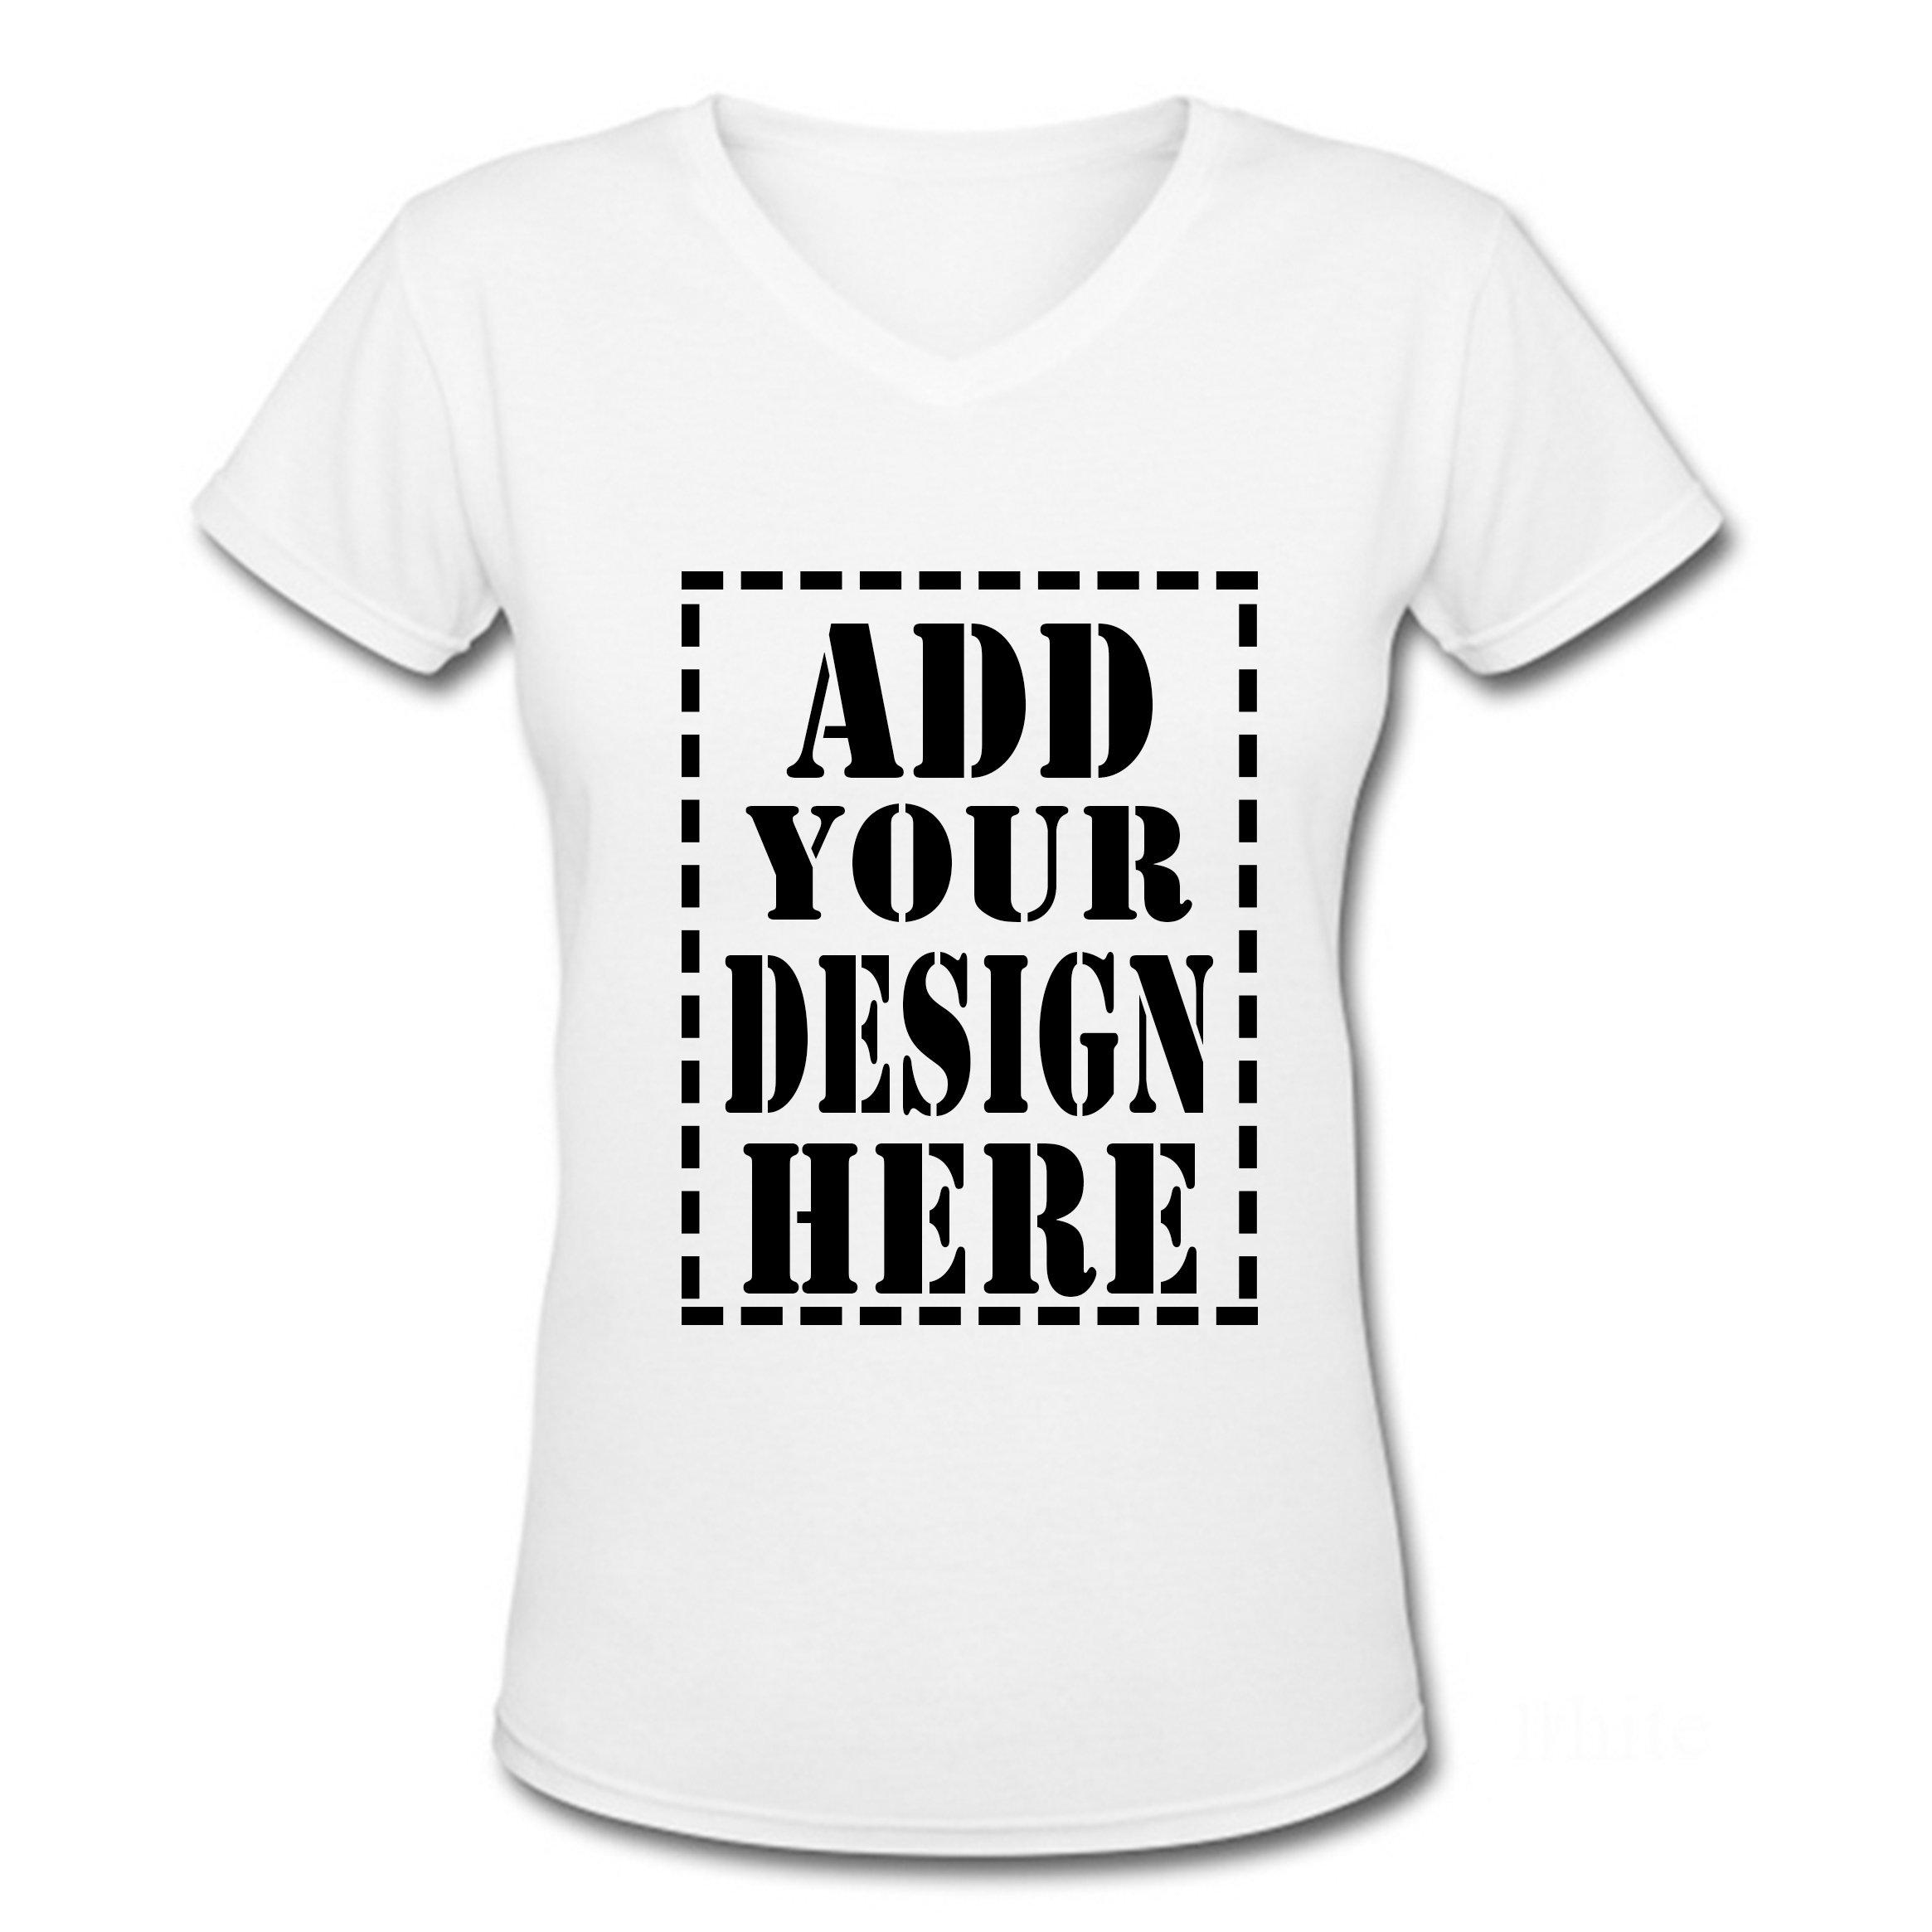 Custom Tshirts Add Your Photo Text Logo And T Shirt 5825